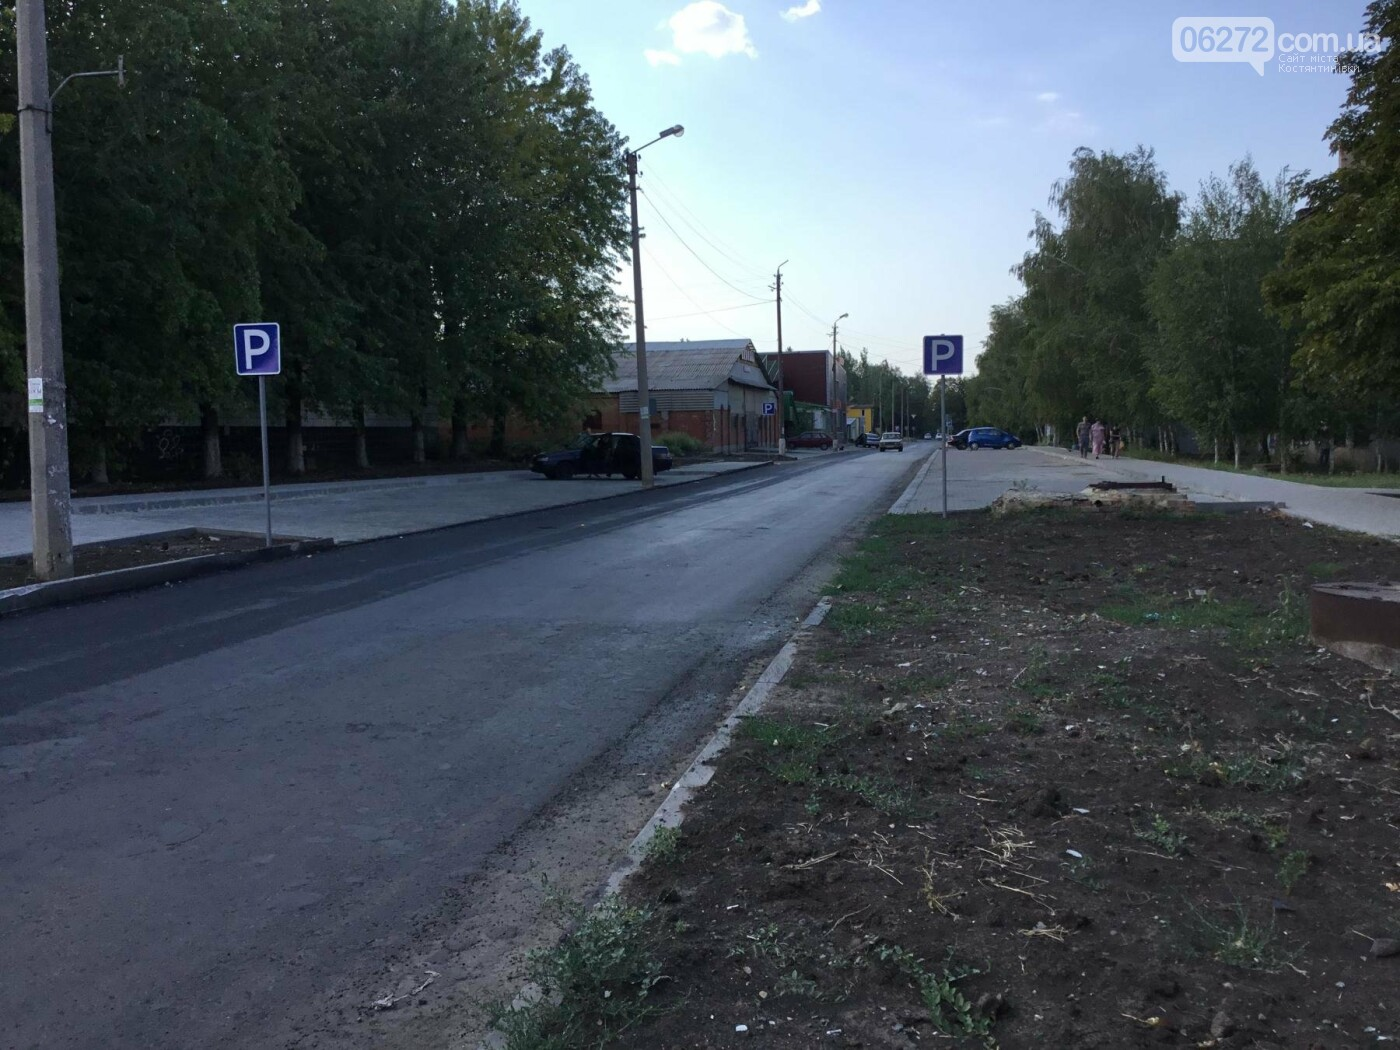 Дорога после ремонта по ул. Леваневского в Константиновке, фото-4